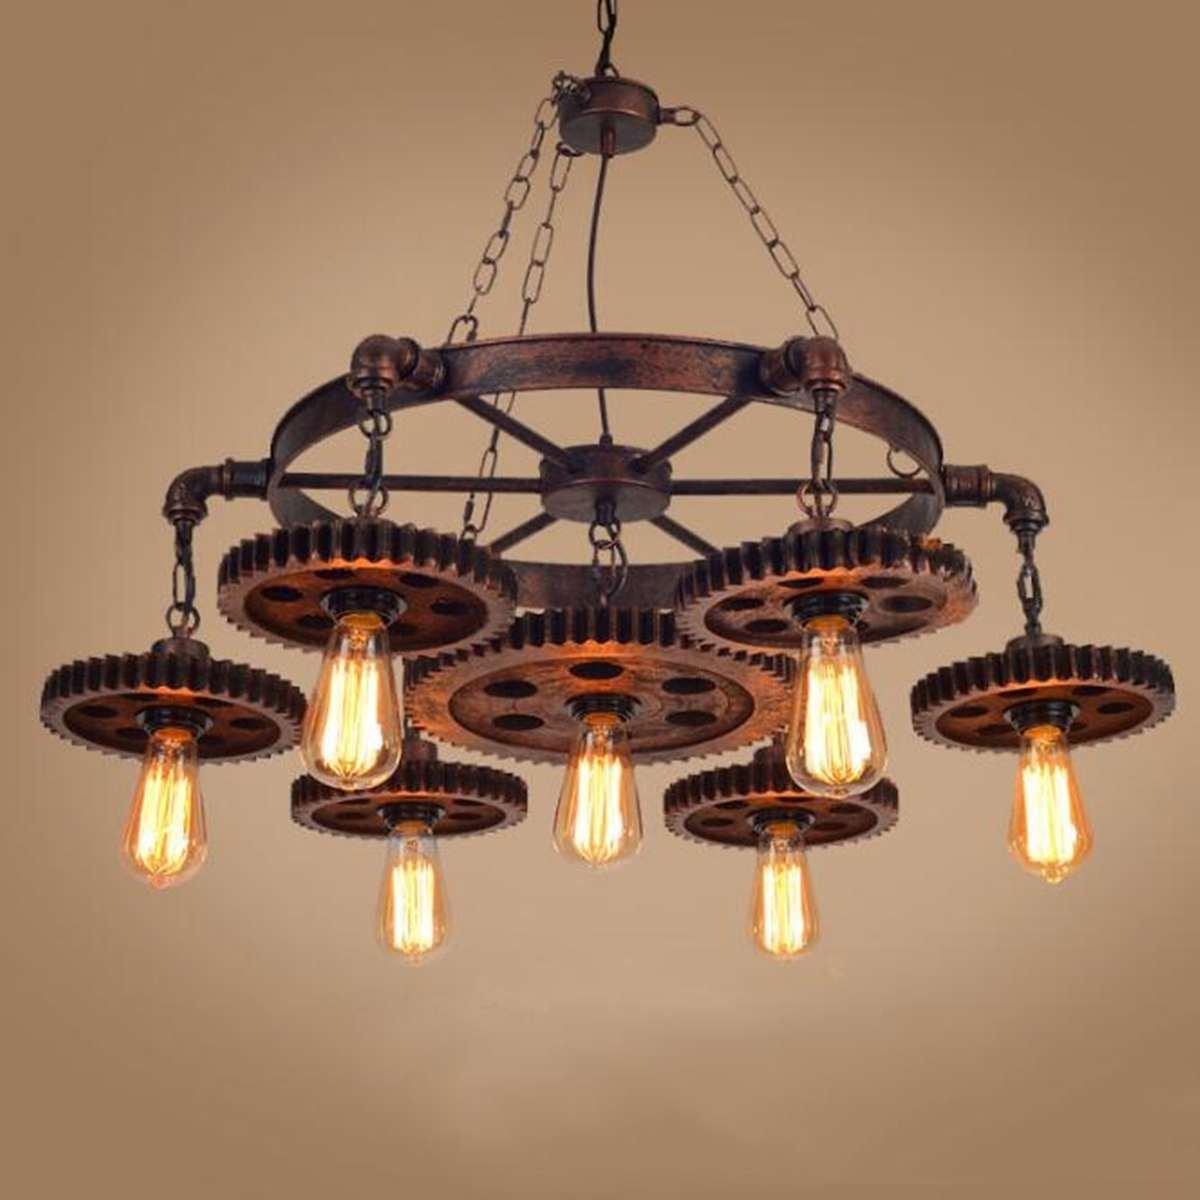 Retro pendant lamp Iron Fixture LED Ceiling Lamp Industrial Chandelier E27 Indoor Lighting for Loft Bar Steampunk Light Fixture